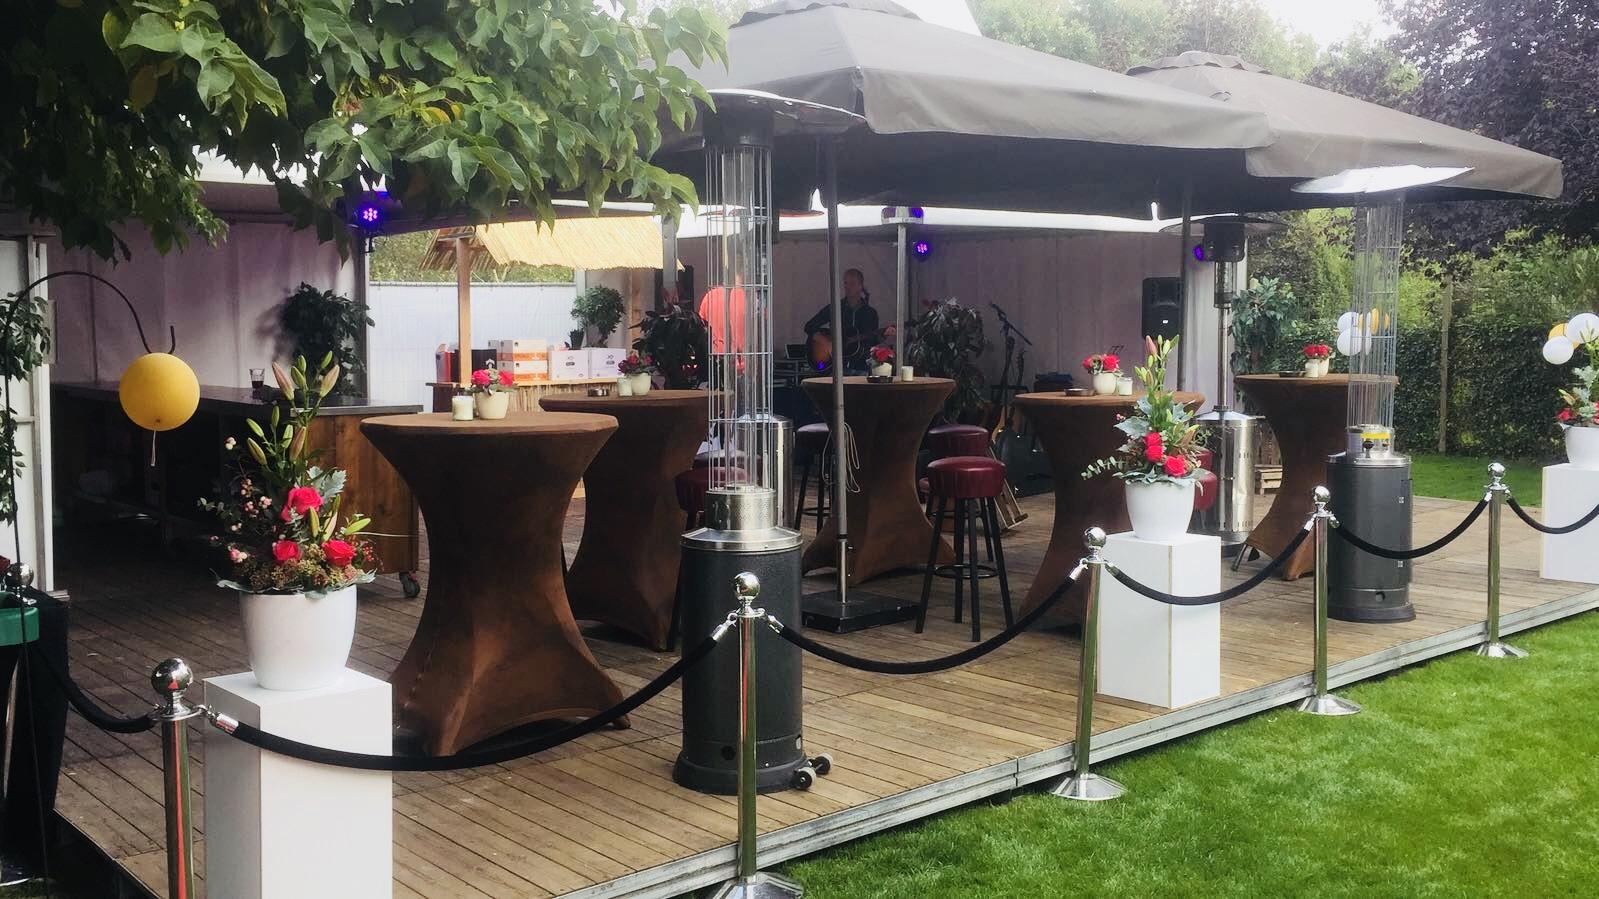 bruiloft emmen rietlanden hapjes drankjes aankleding eurocatering 2